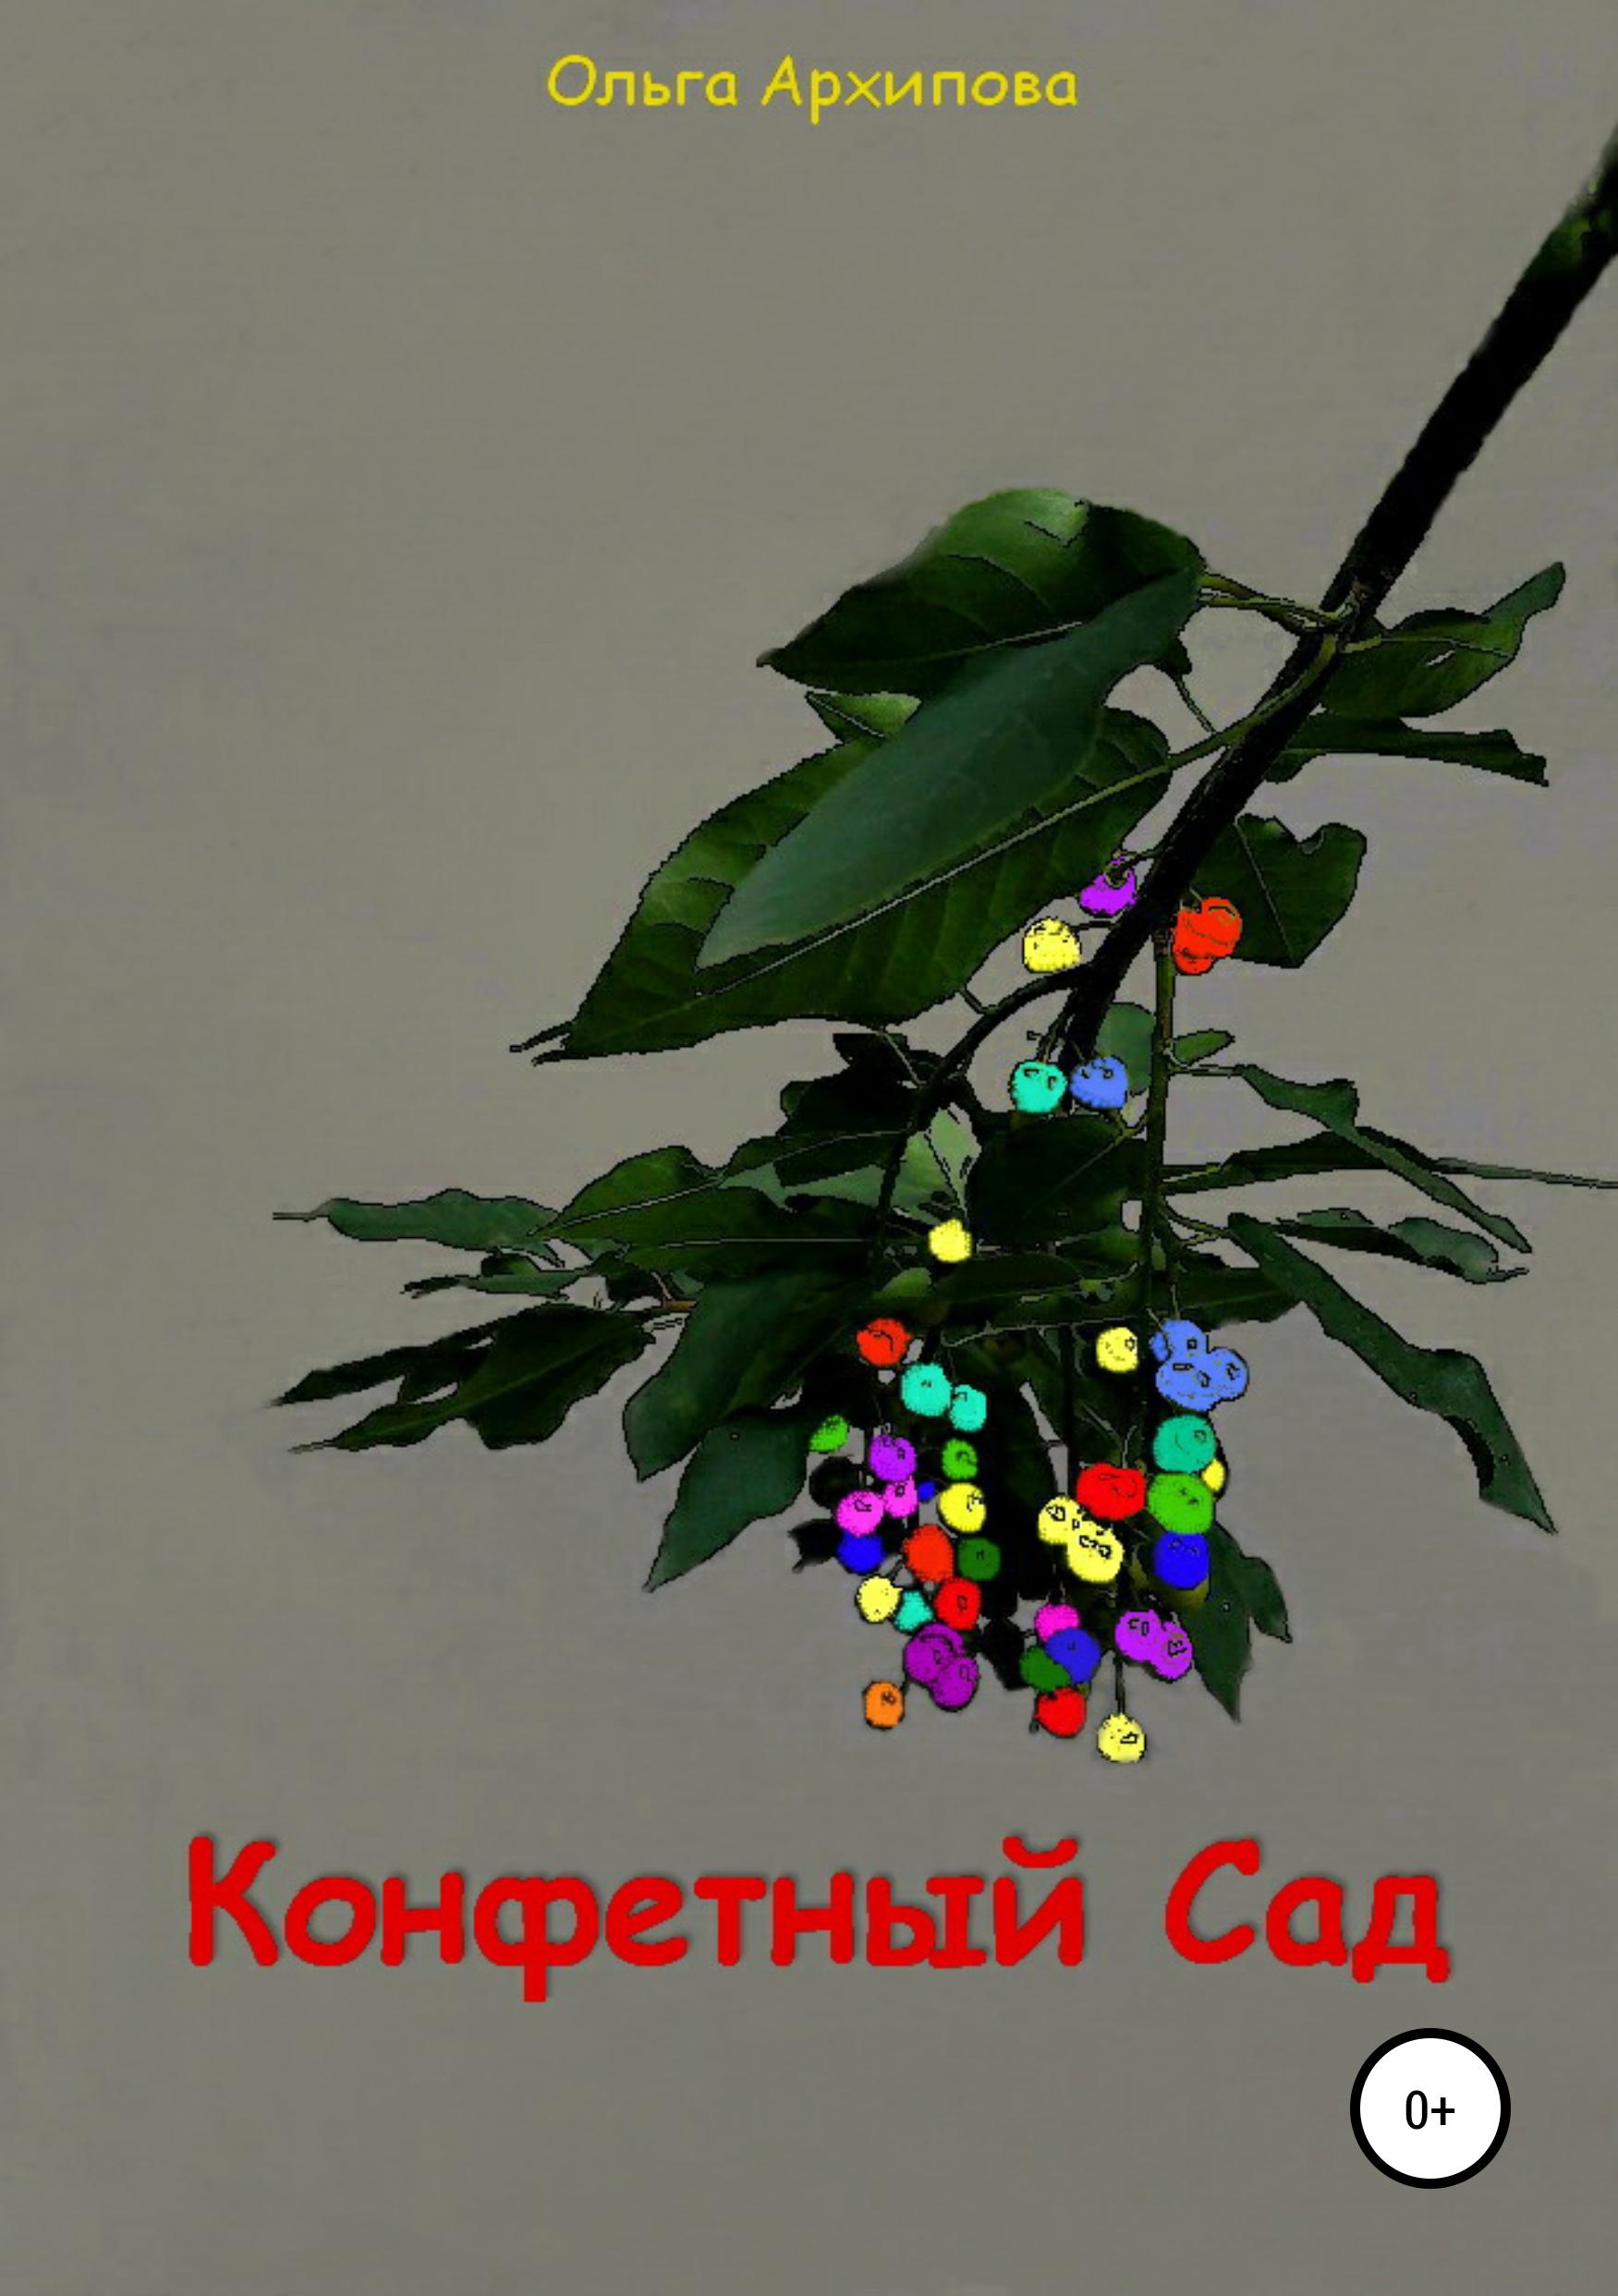 Ольга Архипова Конфетный Сад